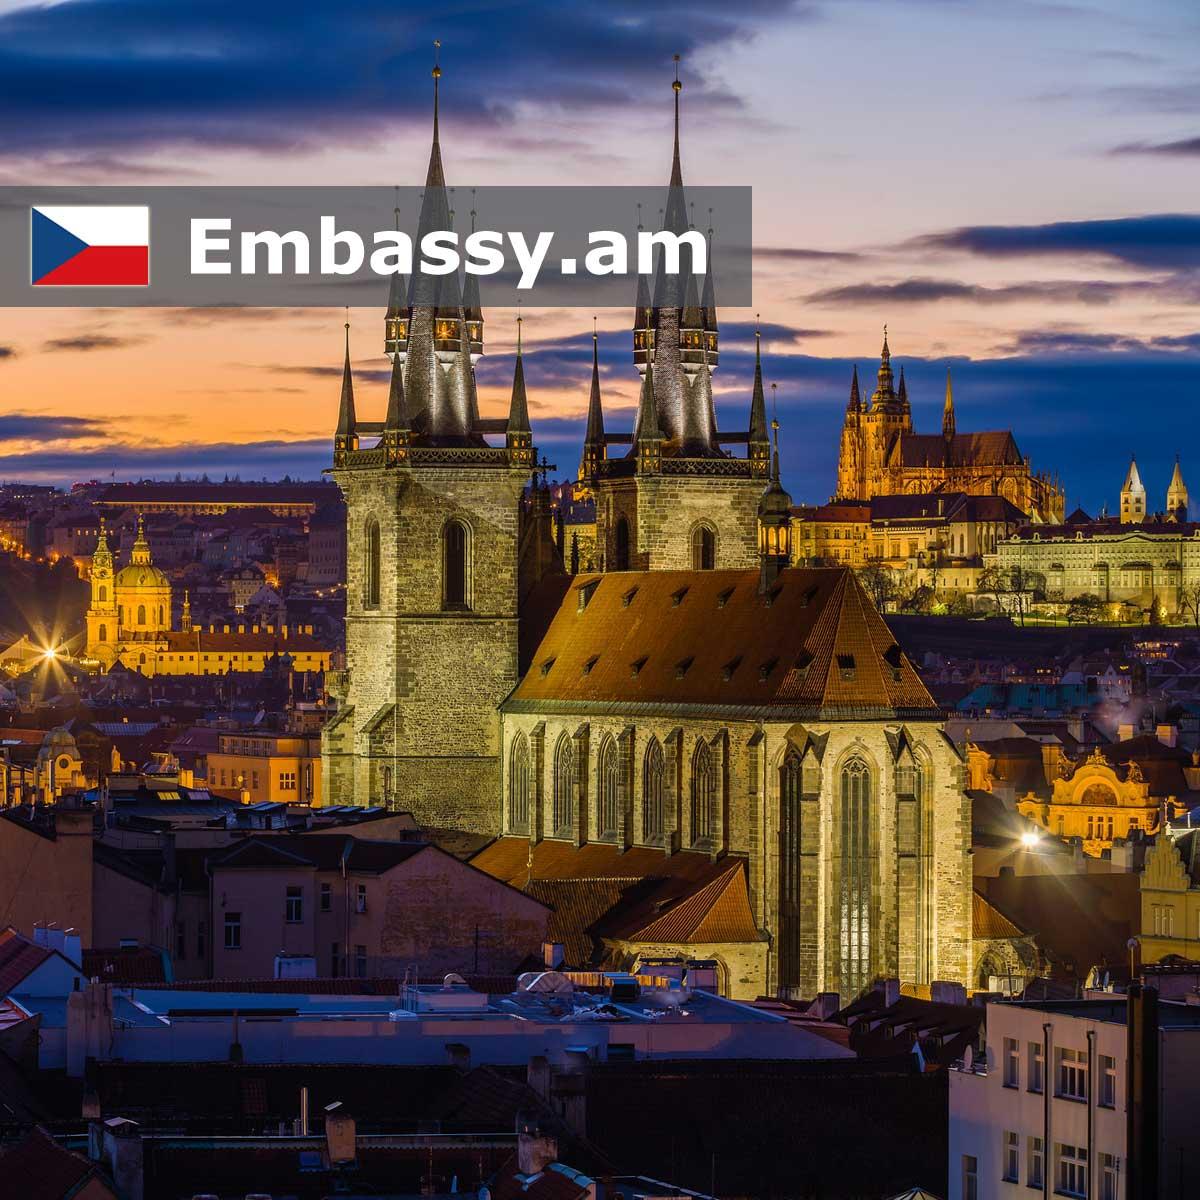 Hotels in Czechia - Embassy.am